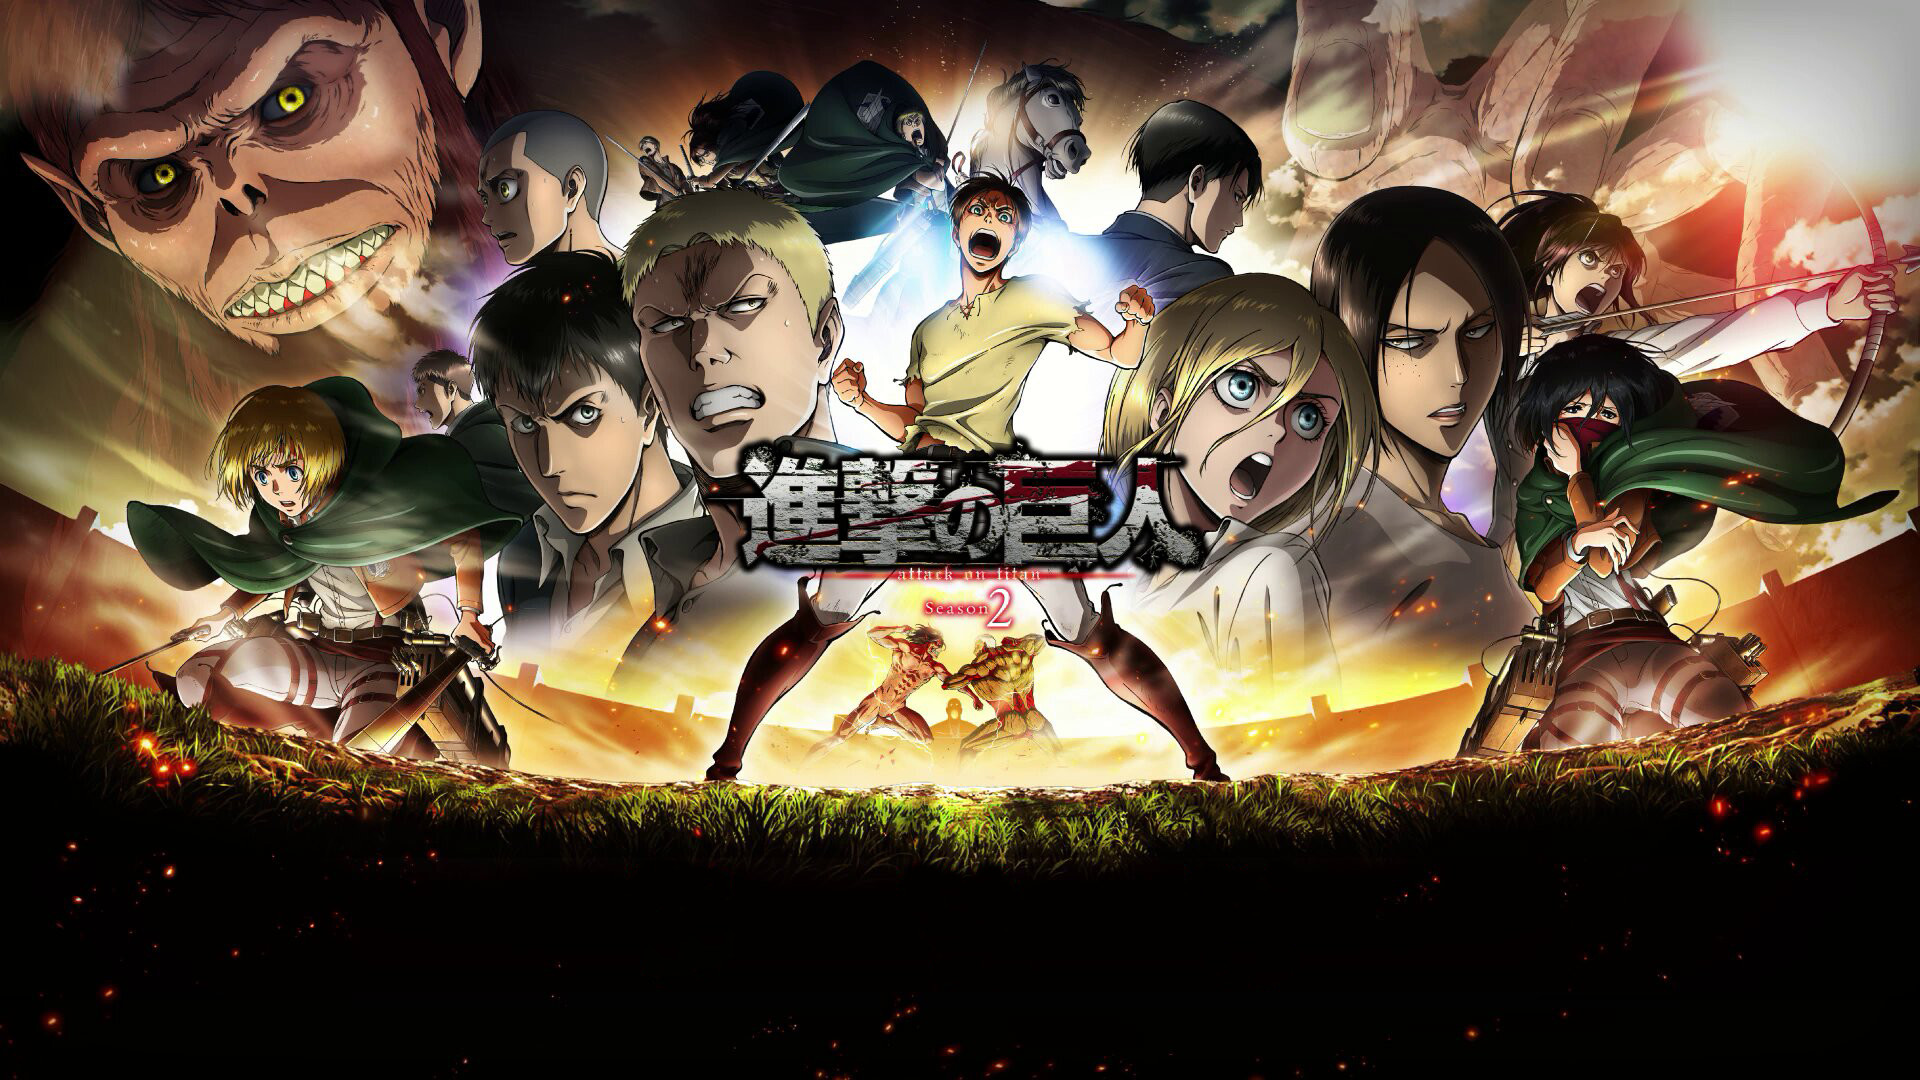 Tags: Anime, Wit Studio, Attack on Titan, Bertholdt Fubar, Levi,